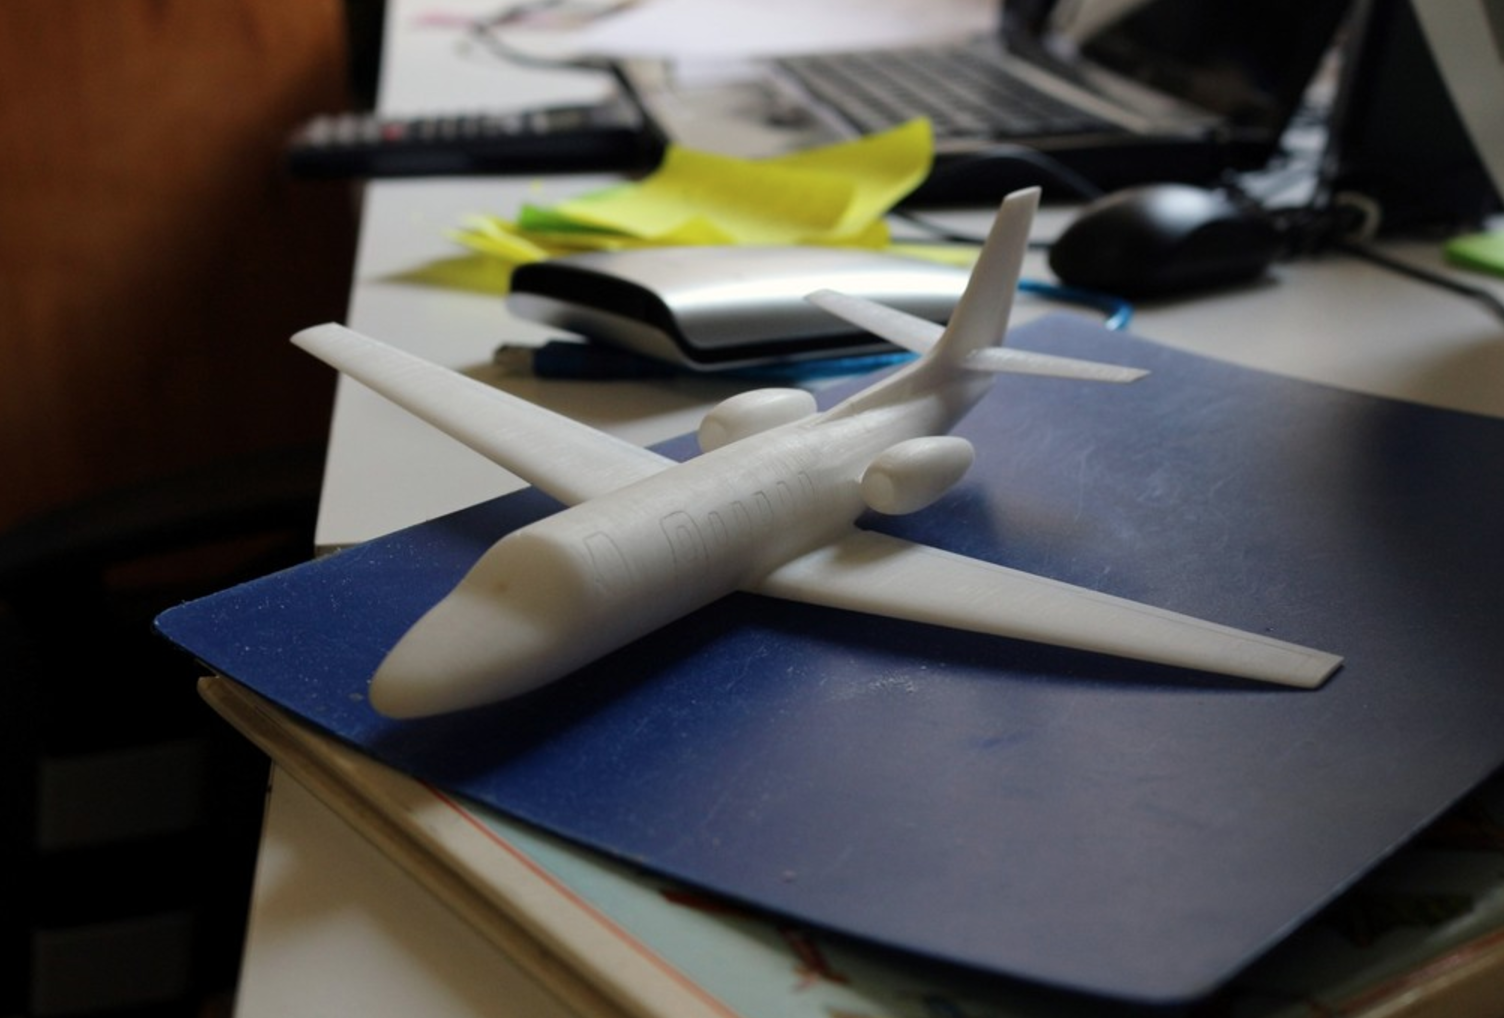 Capture d'écran 2017-04-25 à 19.13.18.png Download free STL file Easy to print Cessna Citation SII 1/64 aircraft scale model • 3D print template, guaro3d